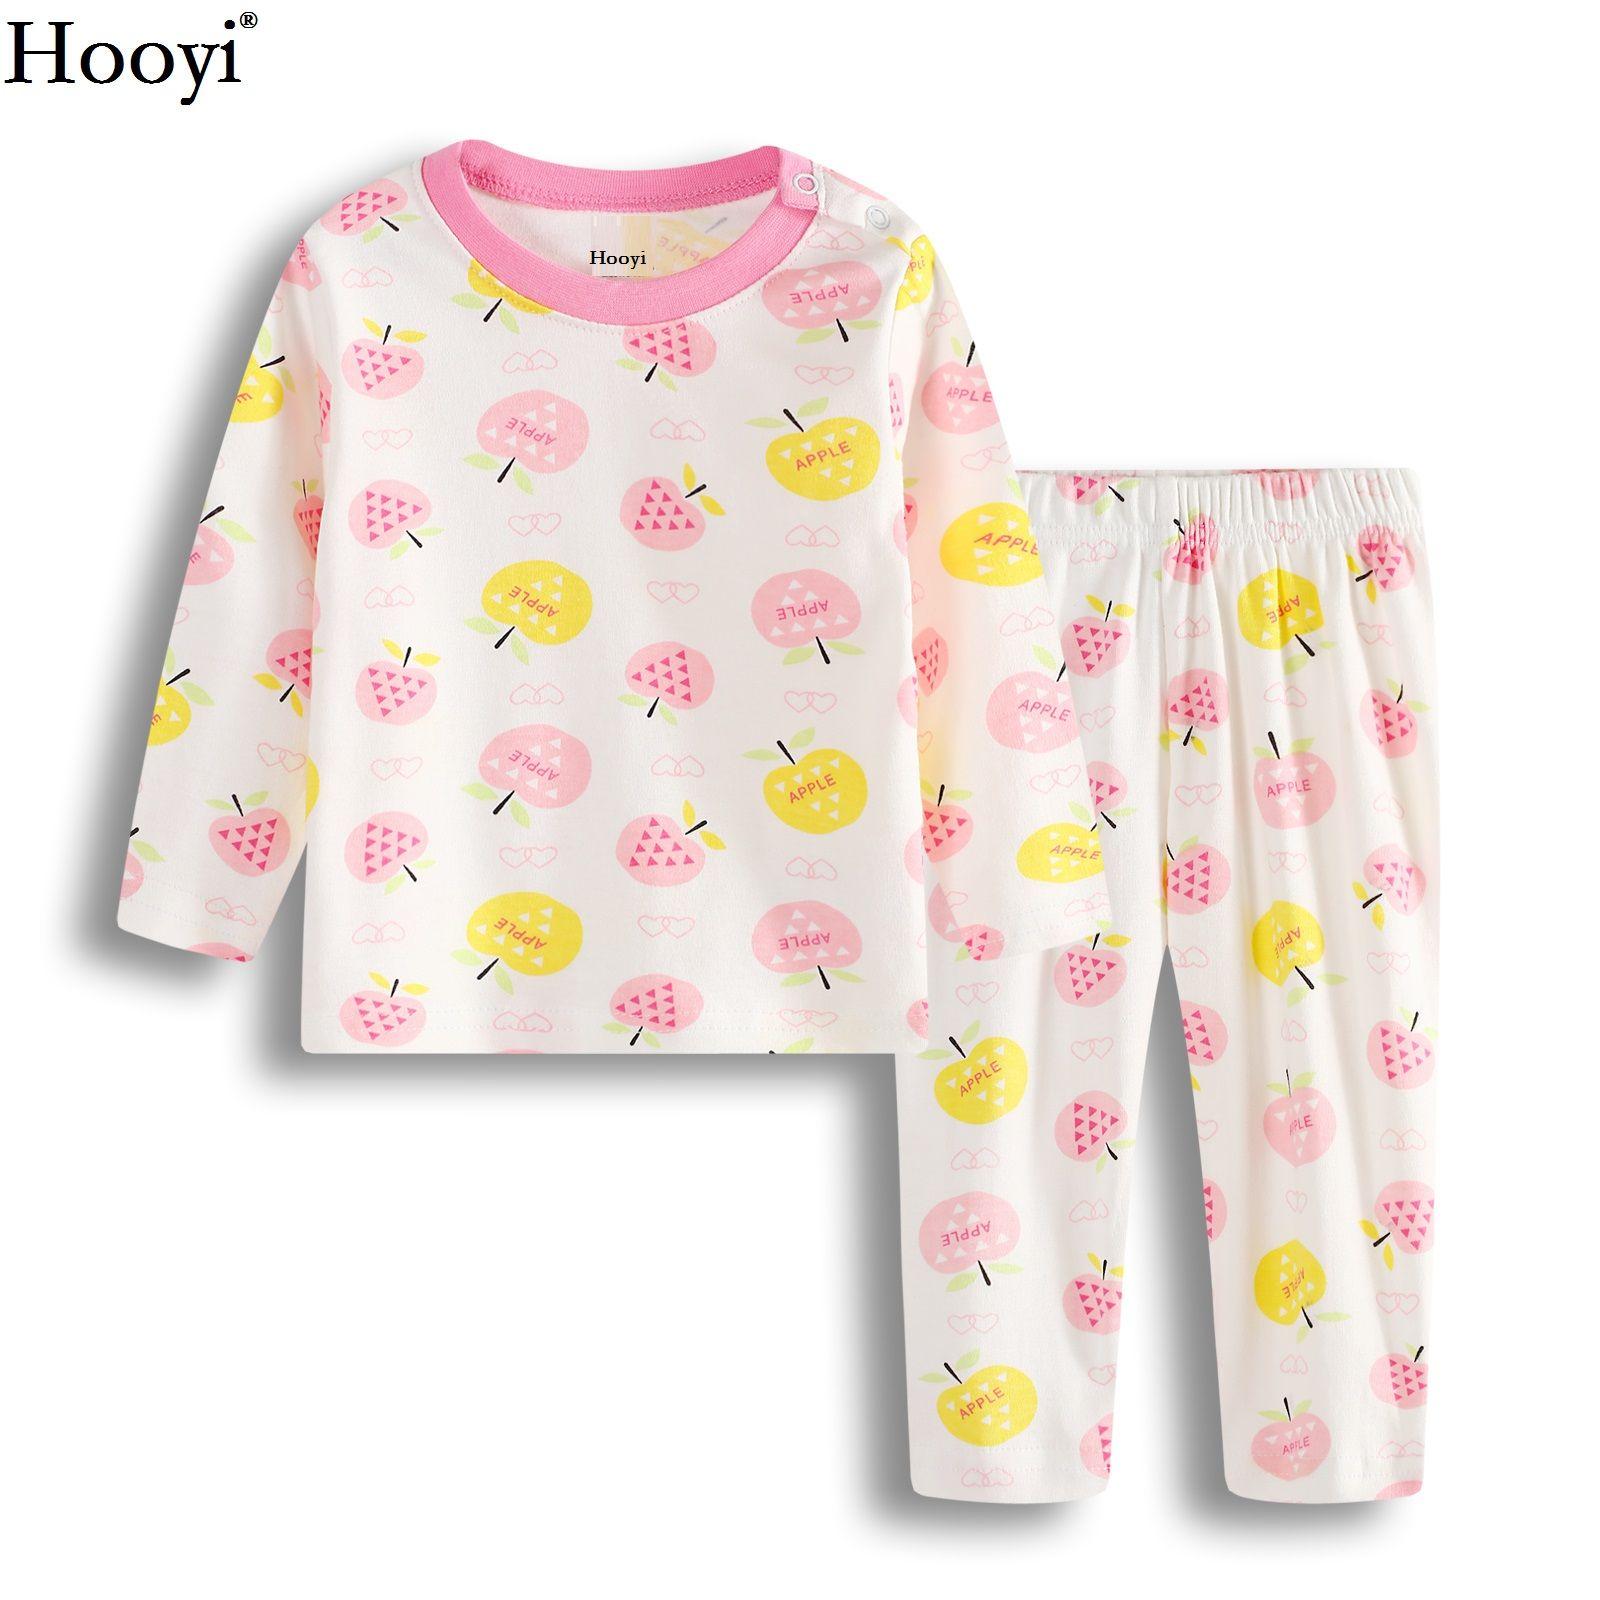 4dbc78ad3f5a2 ... Hooyi Worm Baby Girl Vêtements Ensembles Mode Bébés Pyjamas Vêtements  Costume Infantile T-Shirt Costume ...